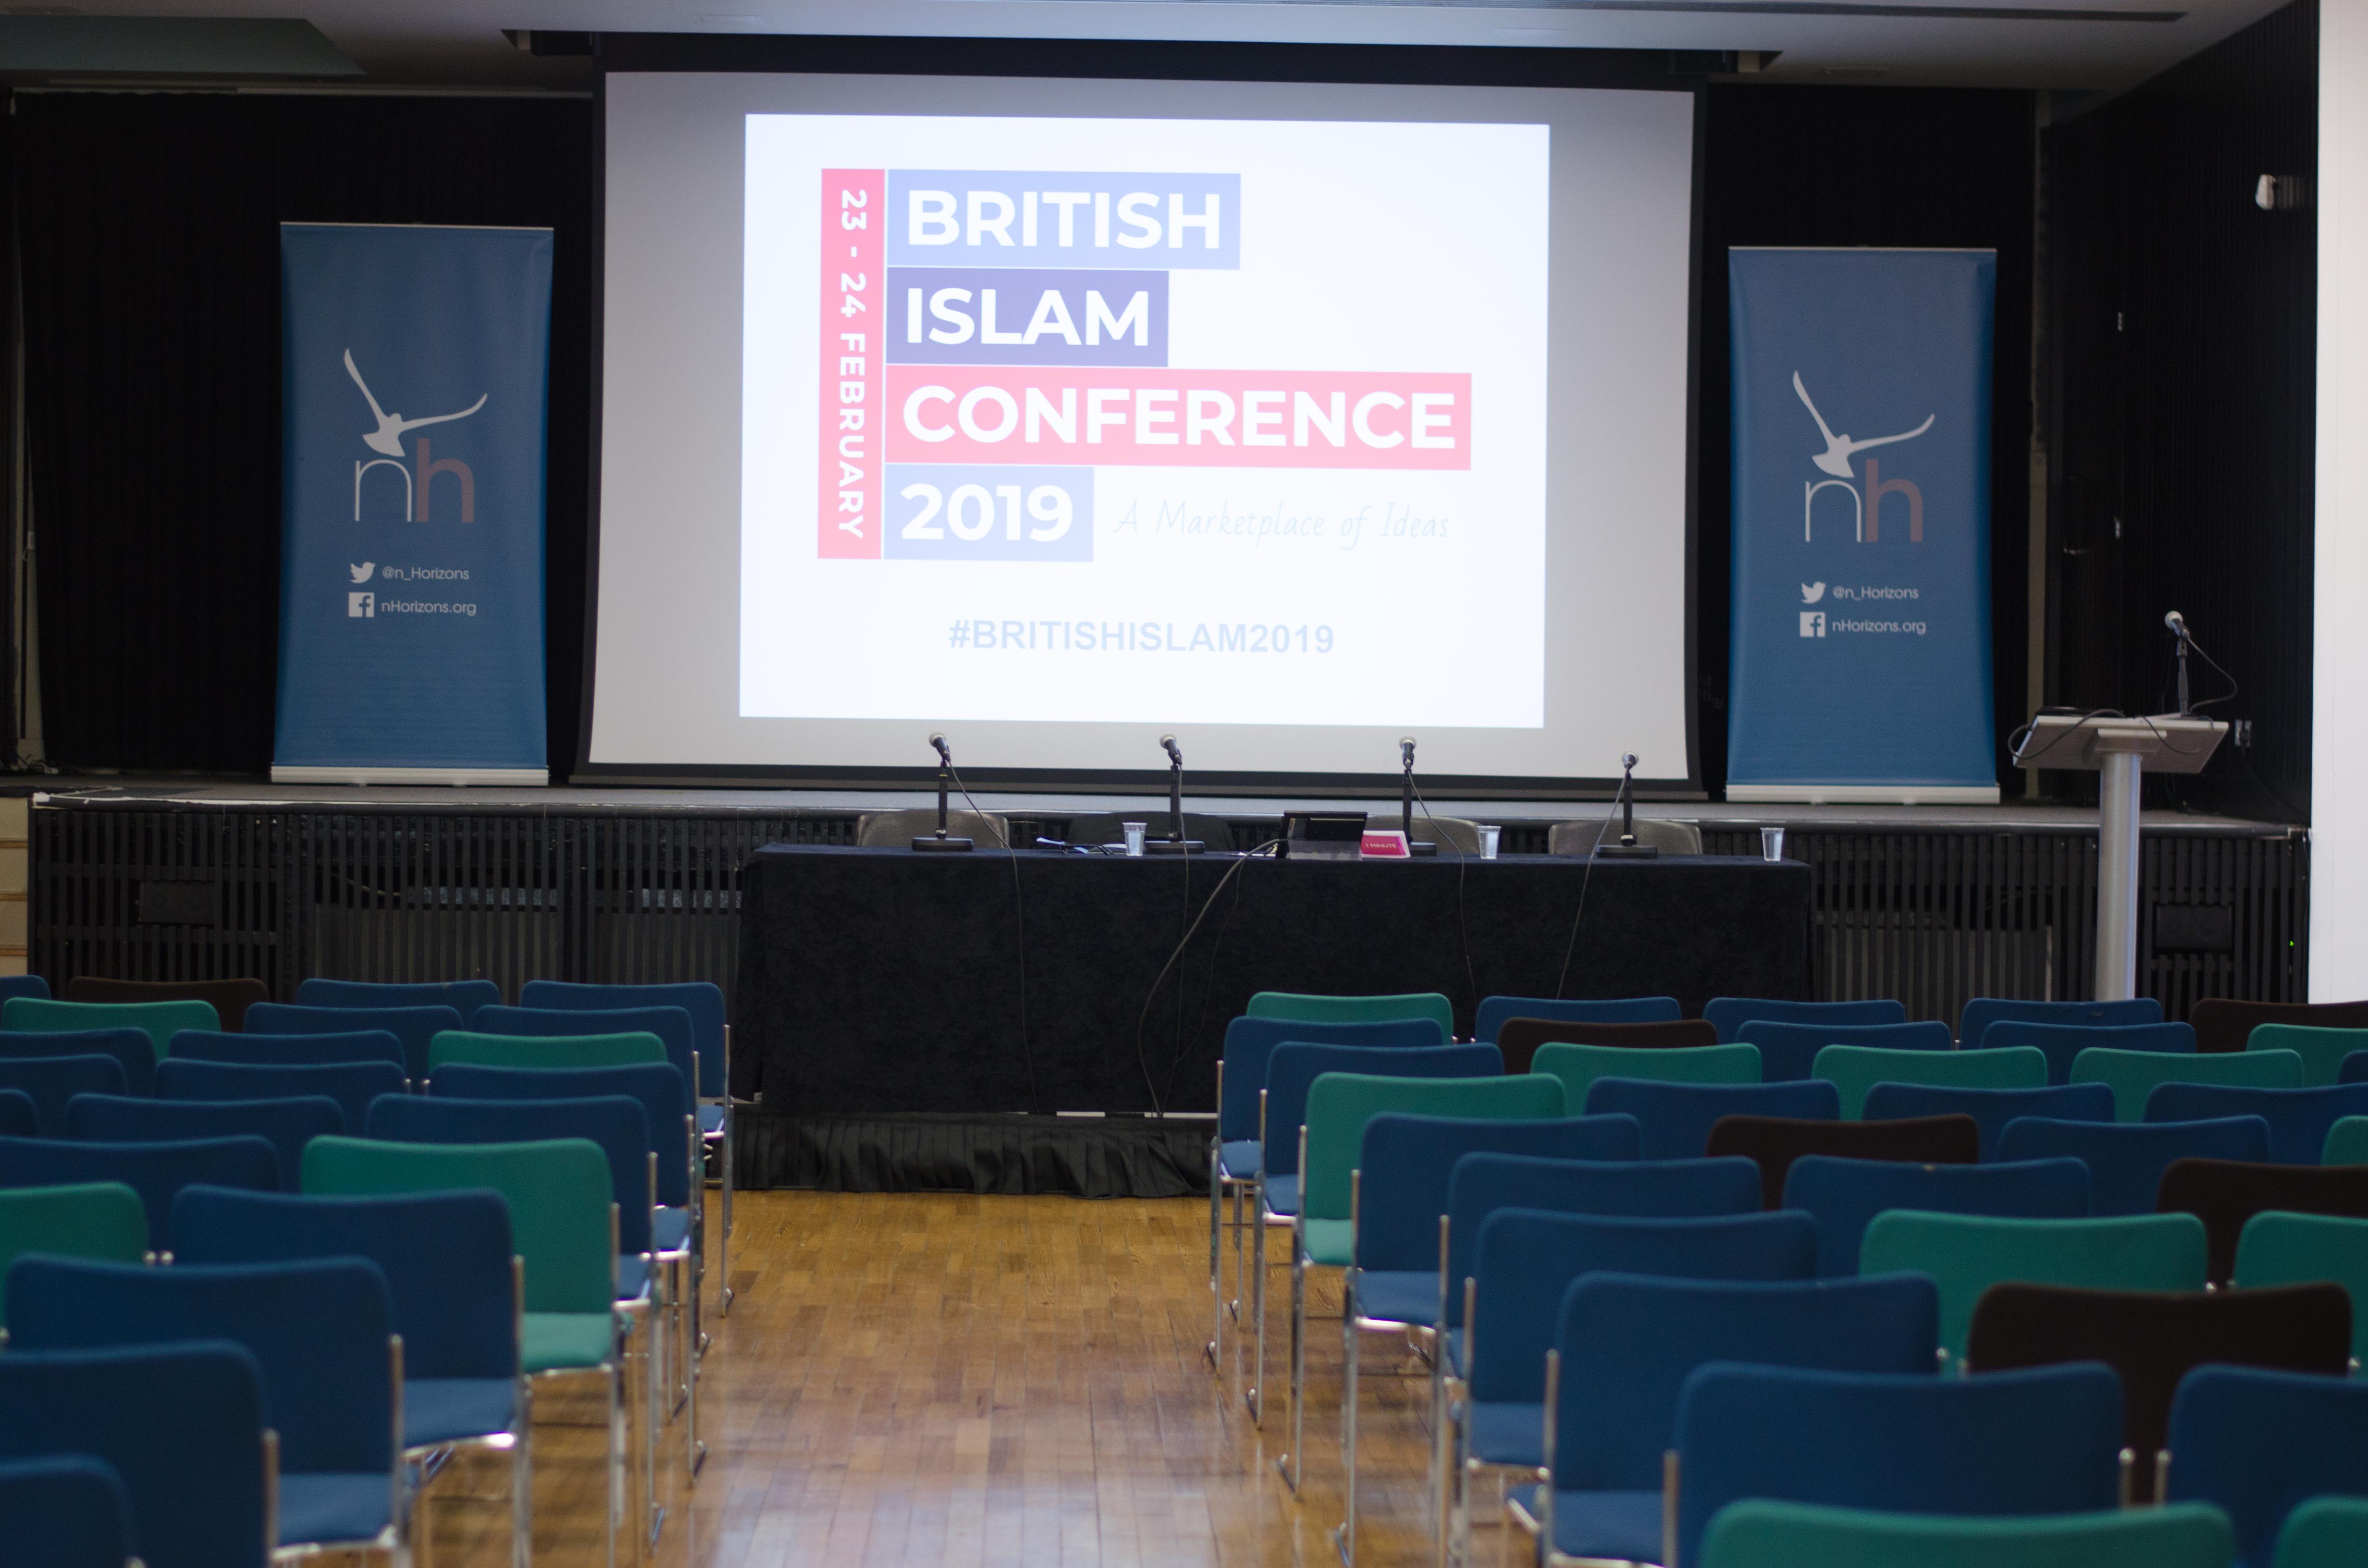 British Islam Conference 2019